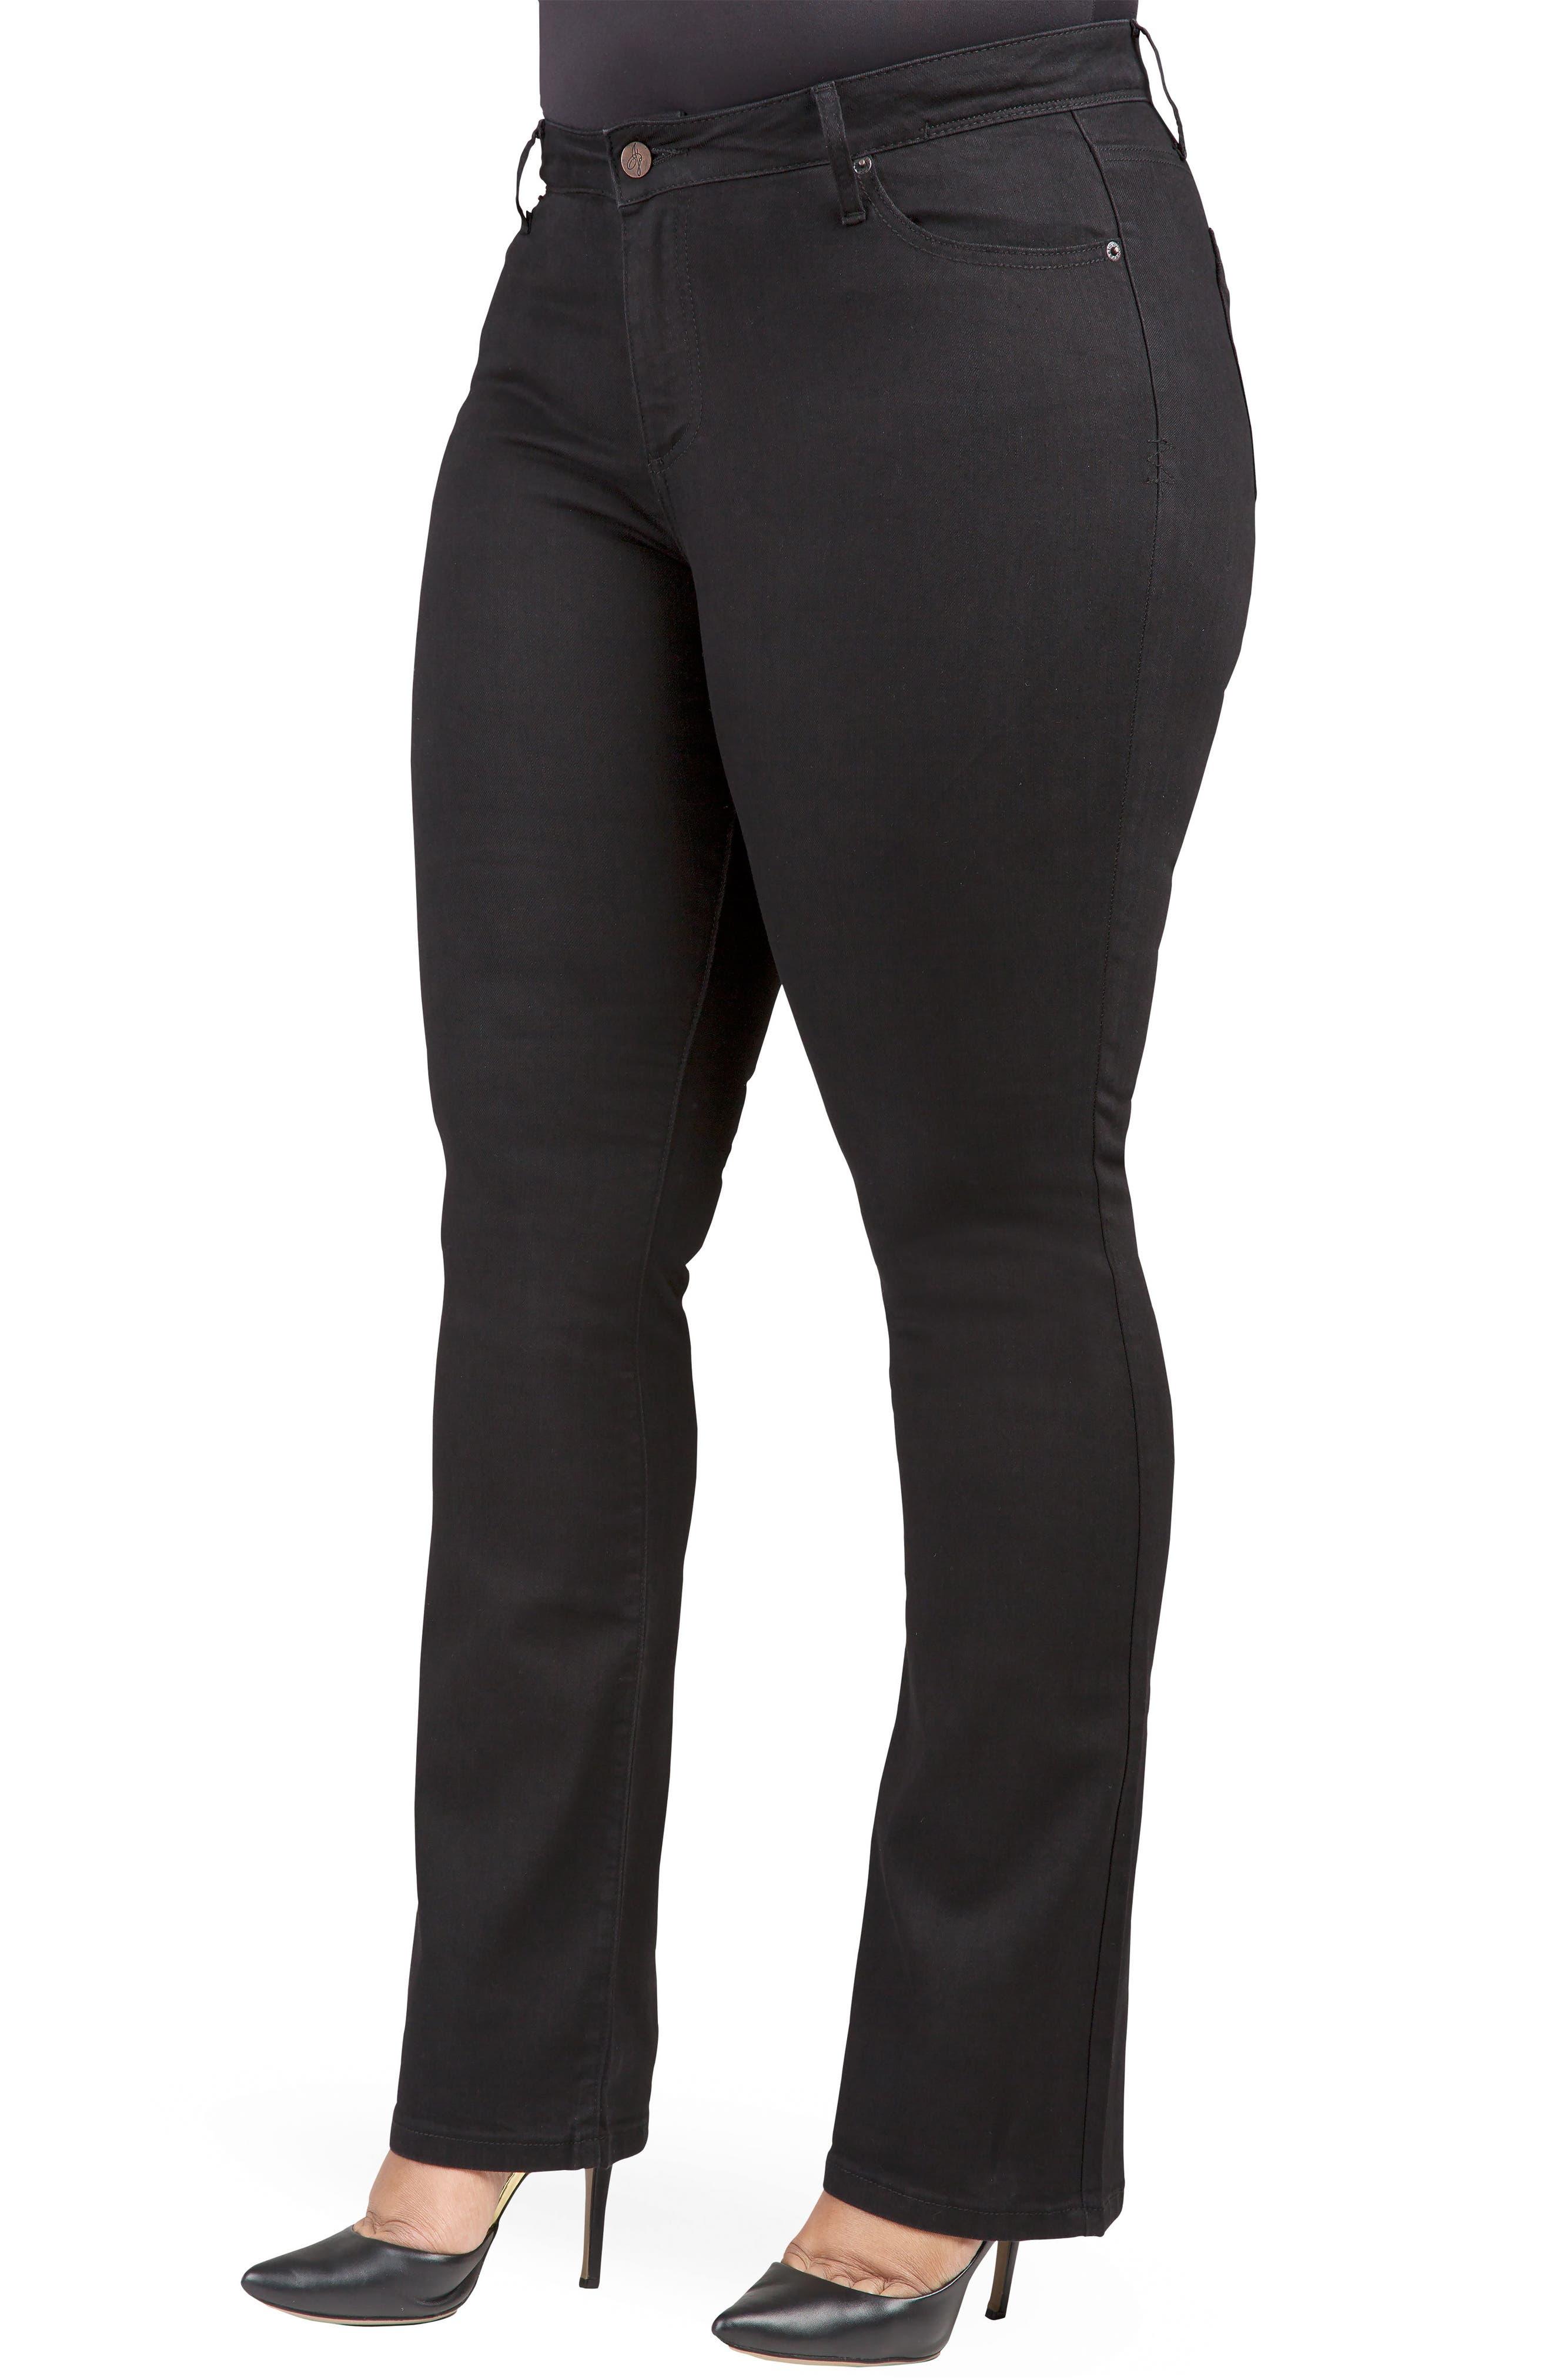 POETIC JUSTICE, Scarlett Slim Bootcut Curvy Fit Jeans, Alternate thumbnail 3, color, RINSE BLACK